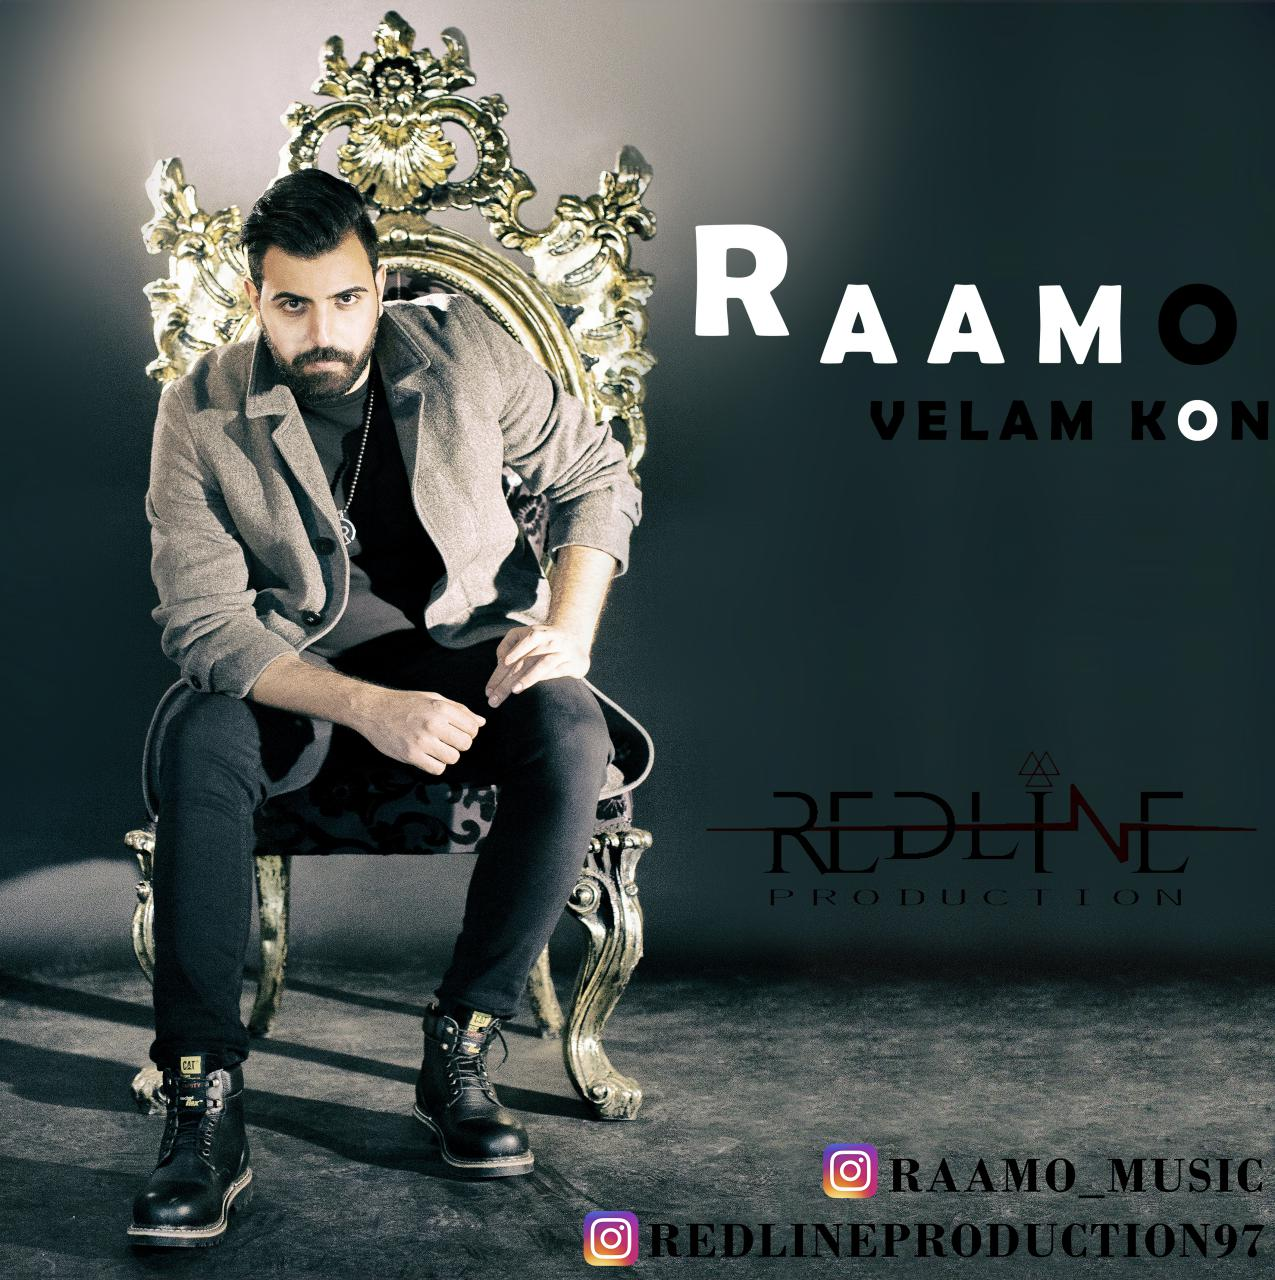 Raamo – Velam Kon